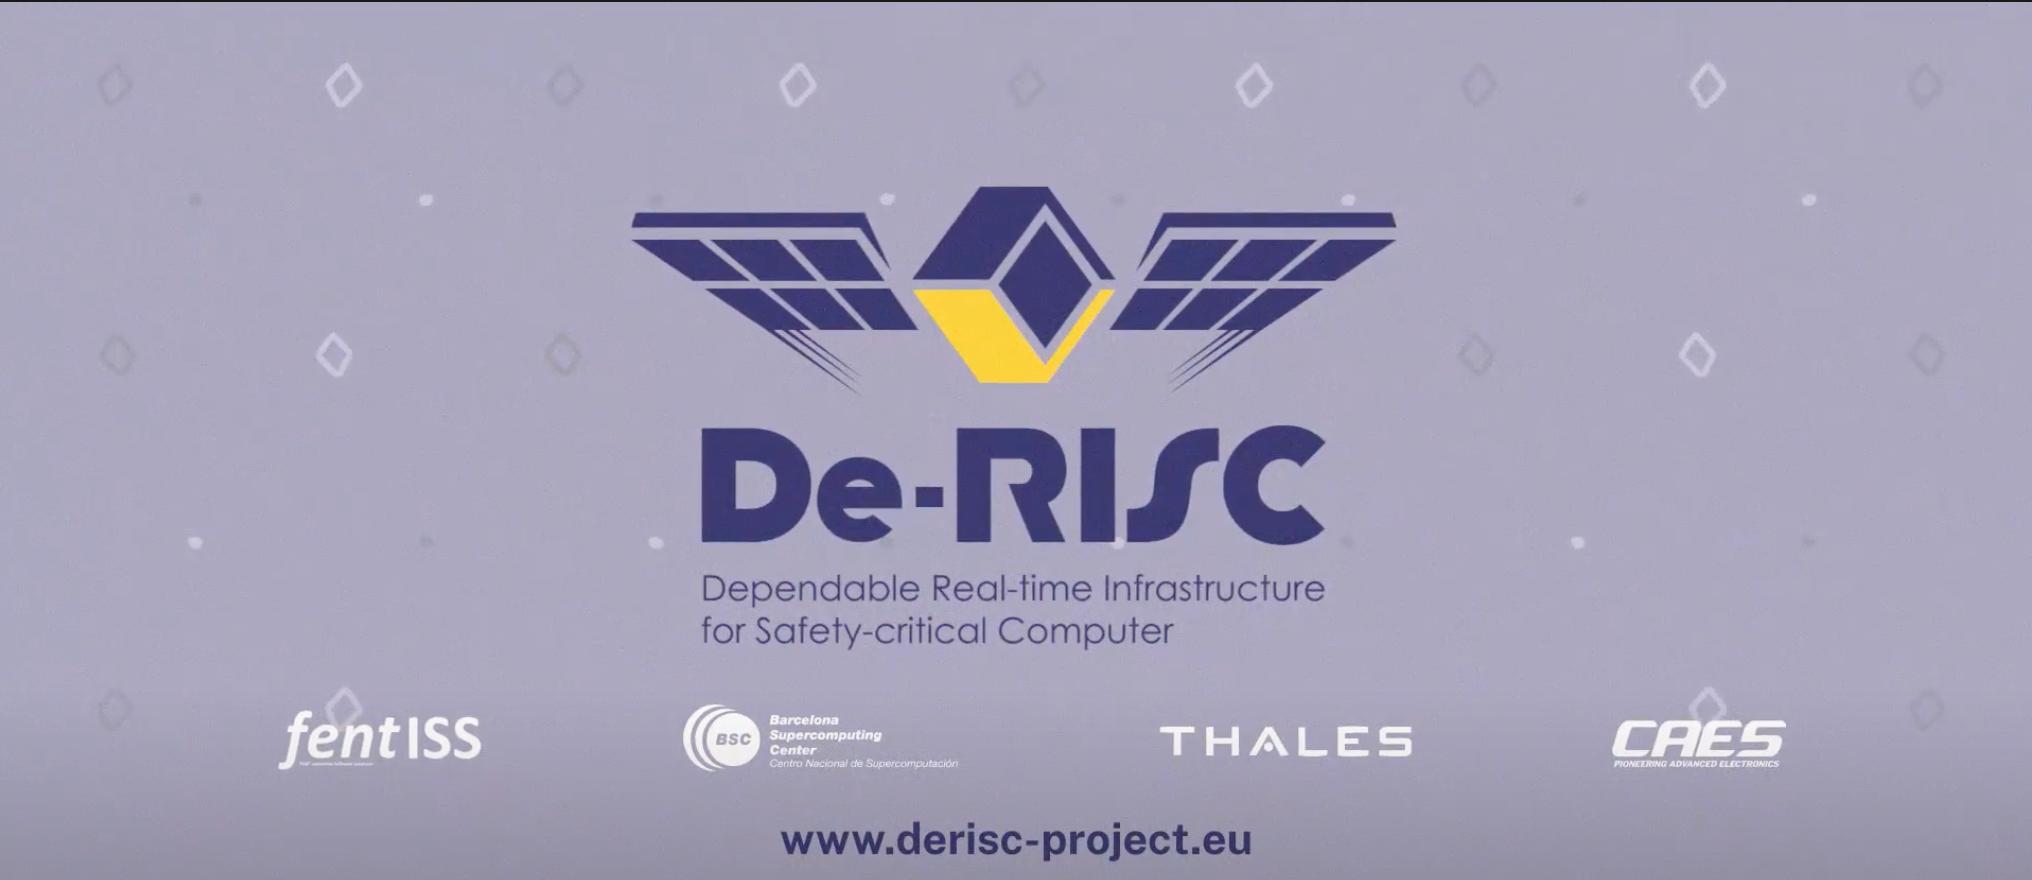 Video: De-RISC project